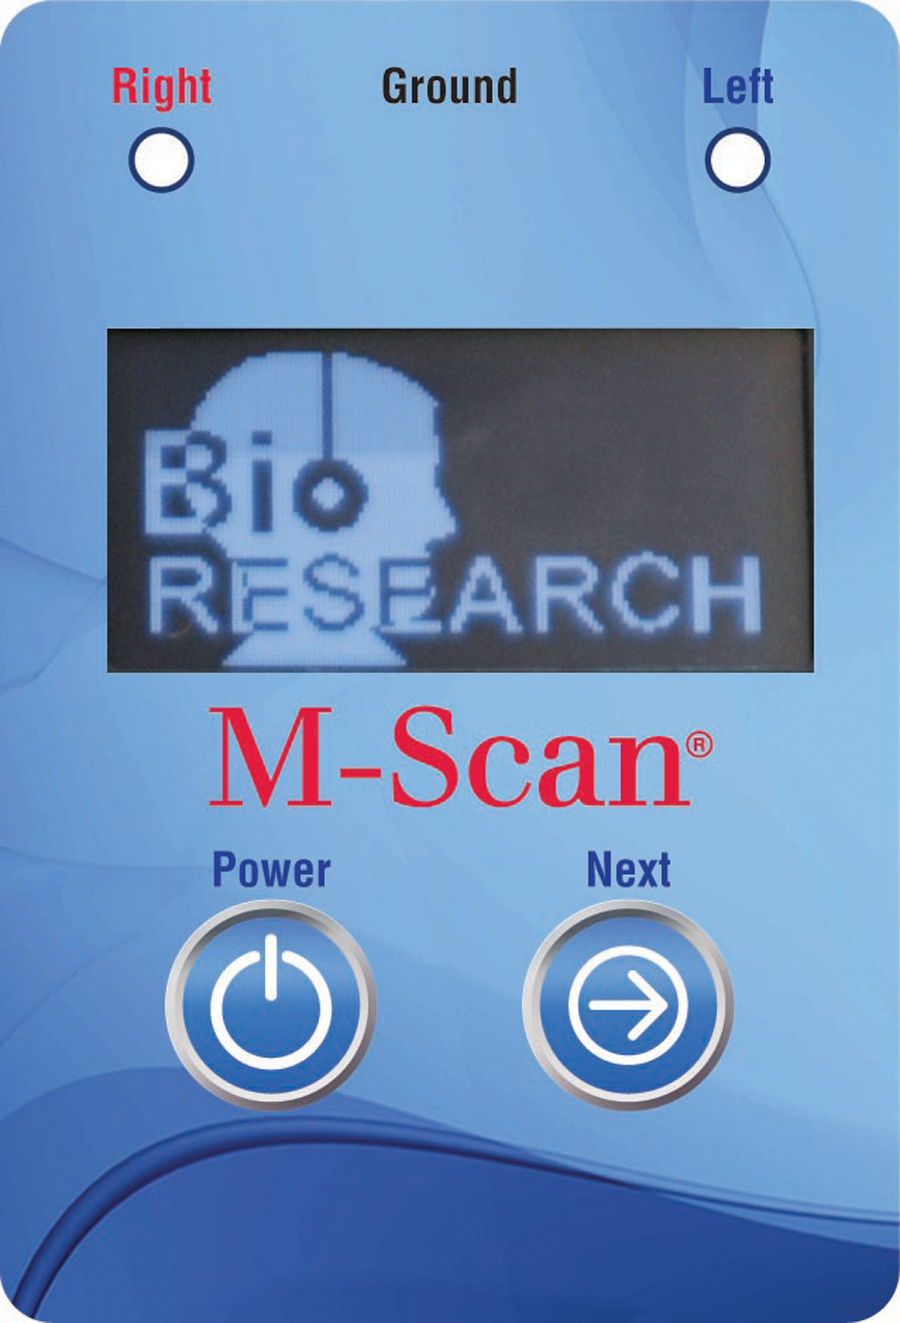 Figure 3. M-Scan